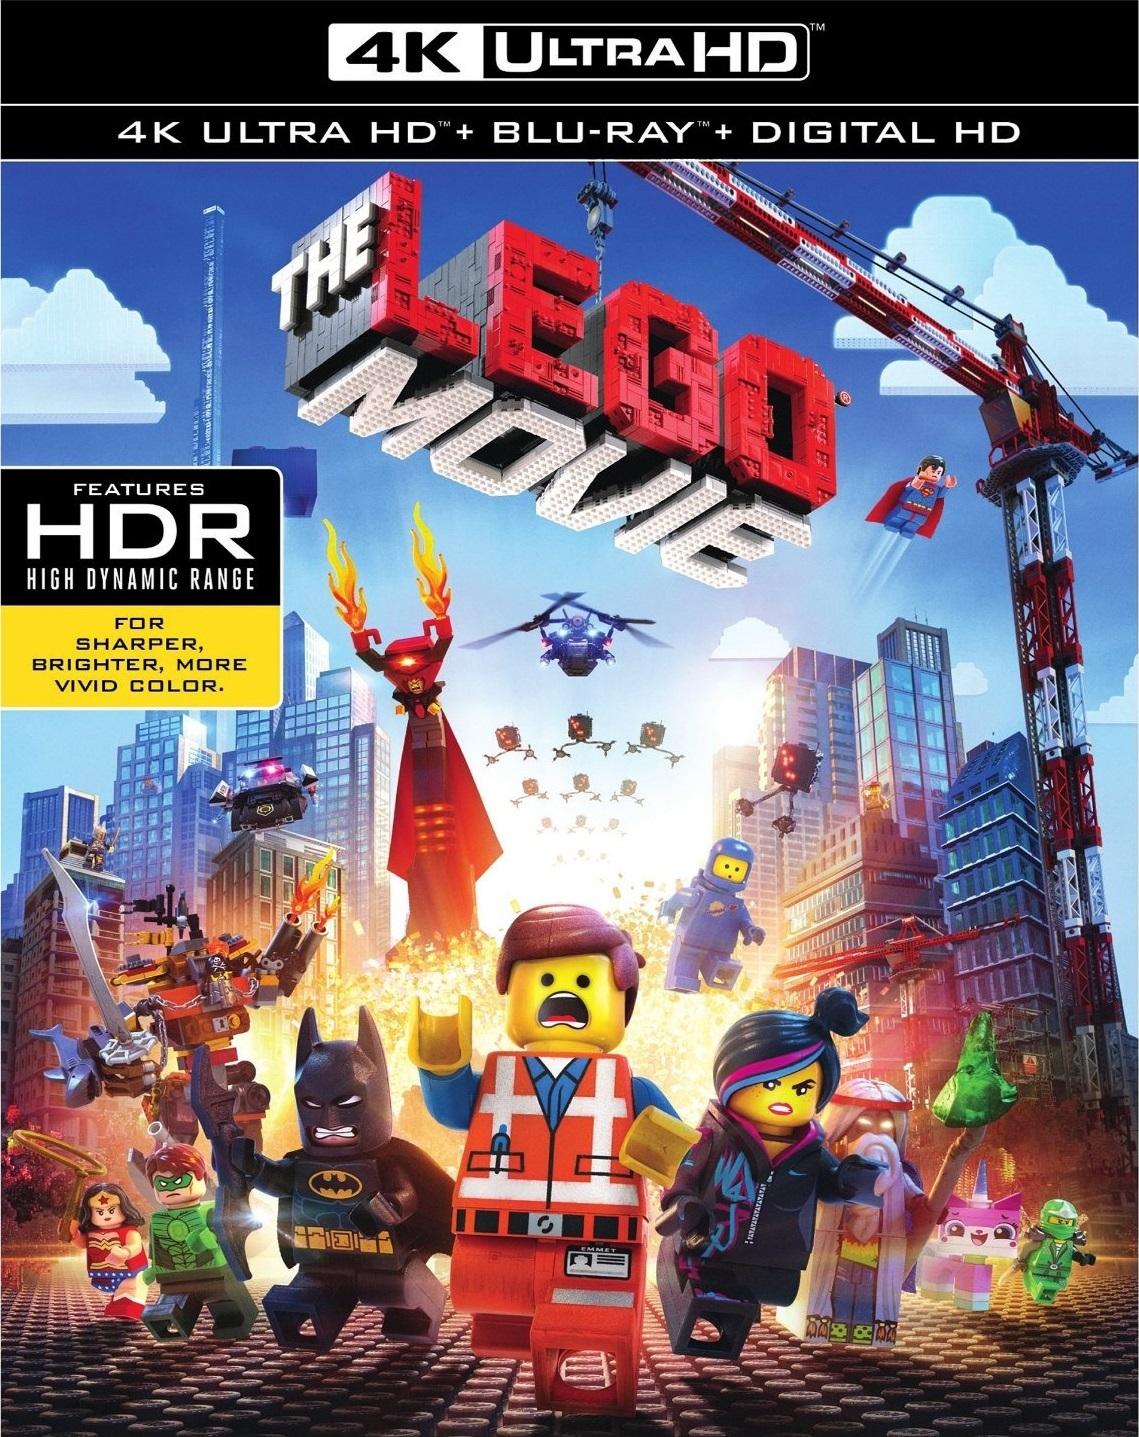 The LEGO Movie (2014) 4K Ultra HD Blu-ray